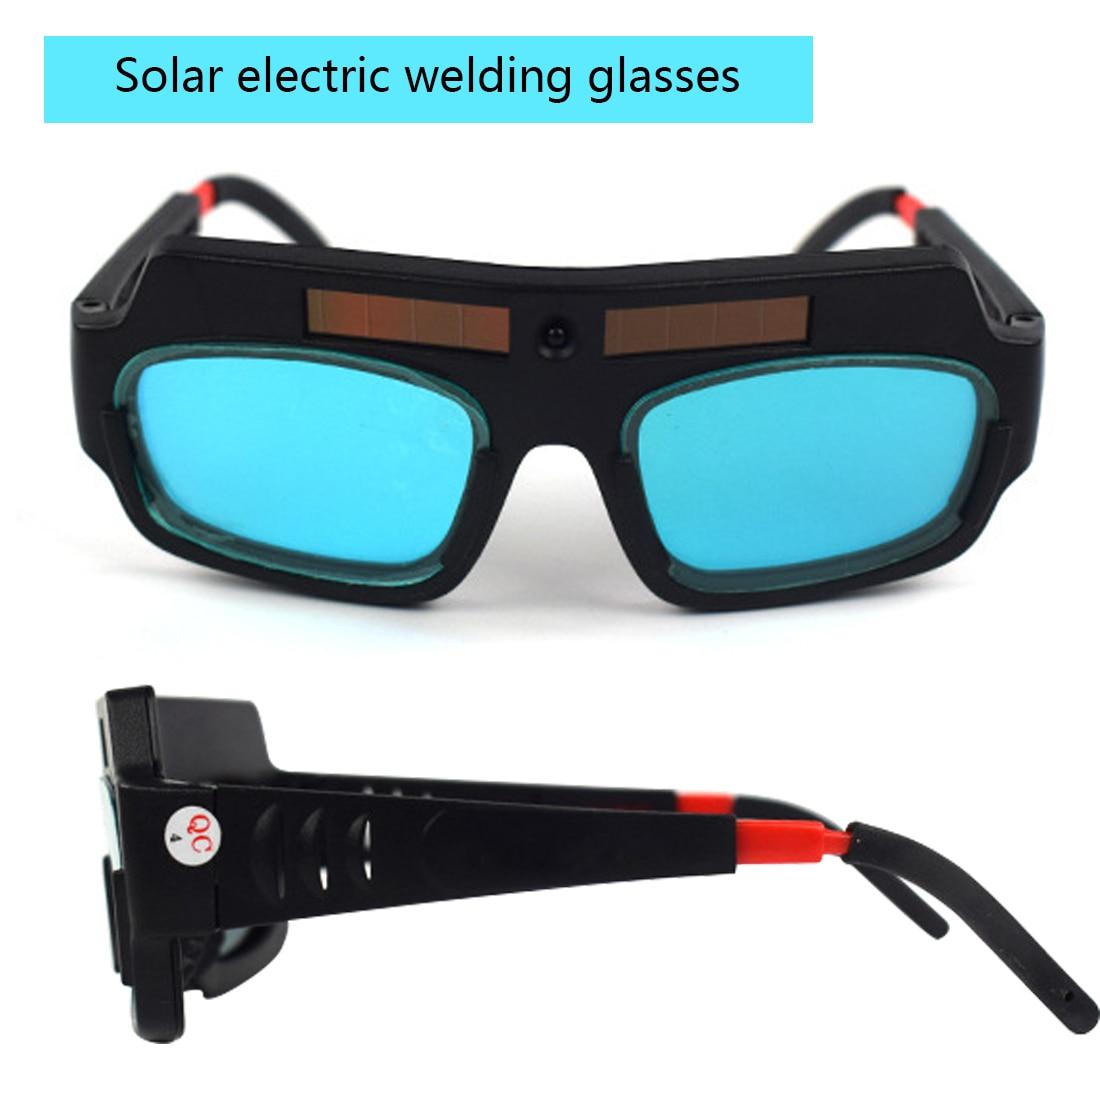 Solar Auto Darkening Welding Goggle Safety Protective Glasses Mask Helmet GA